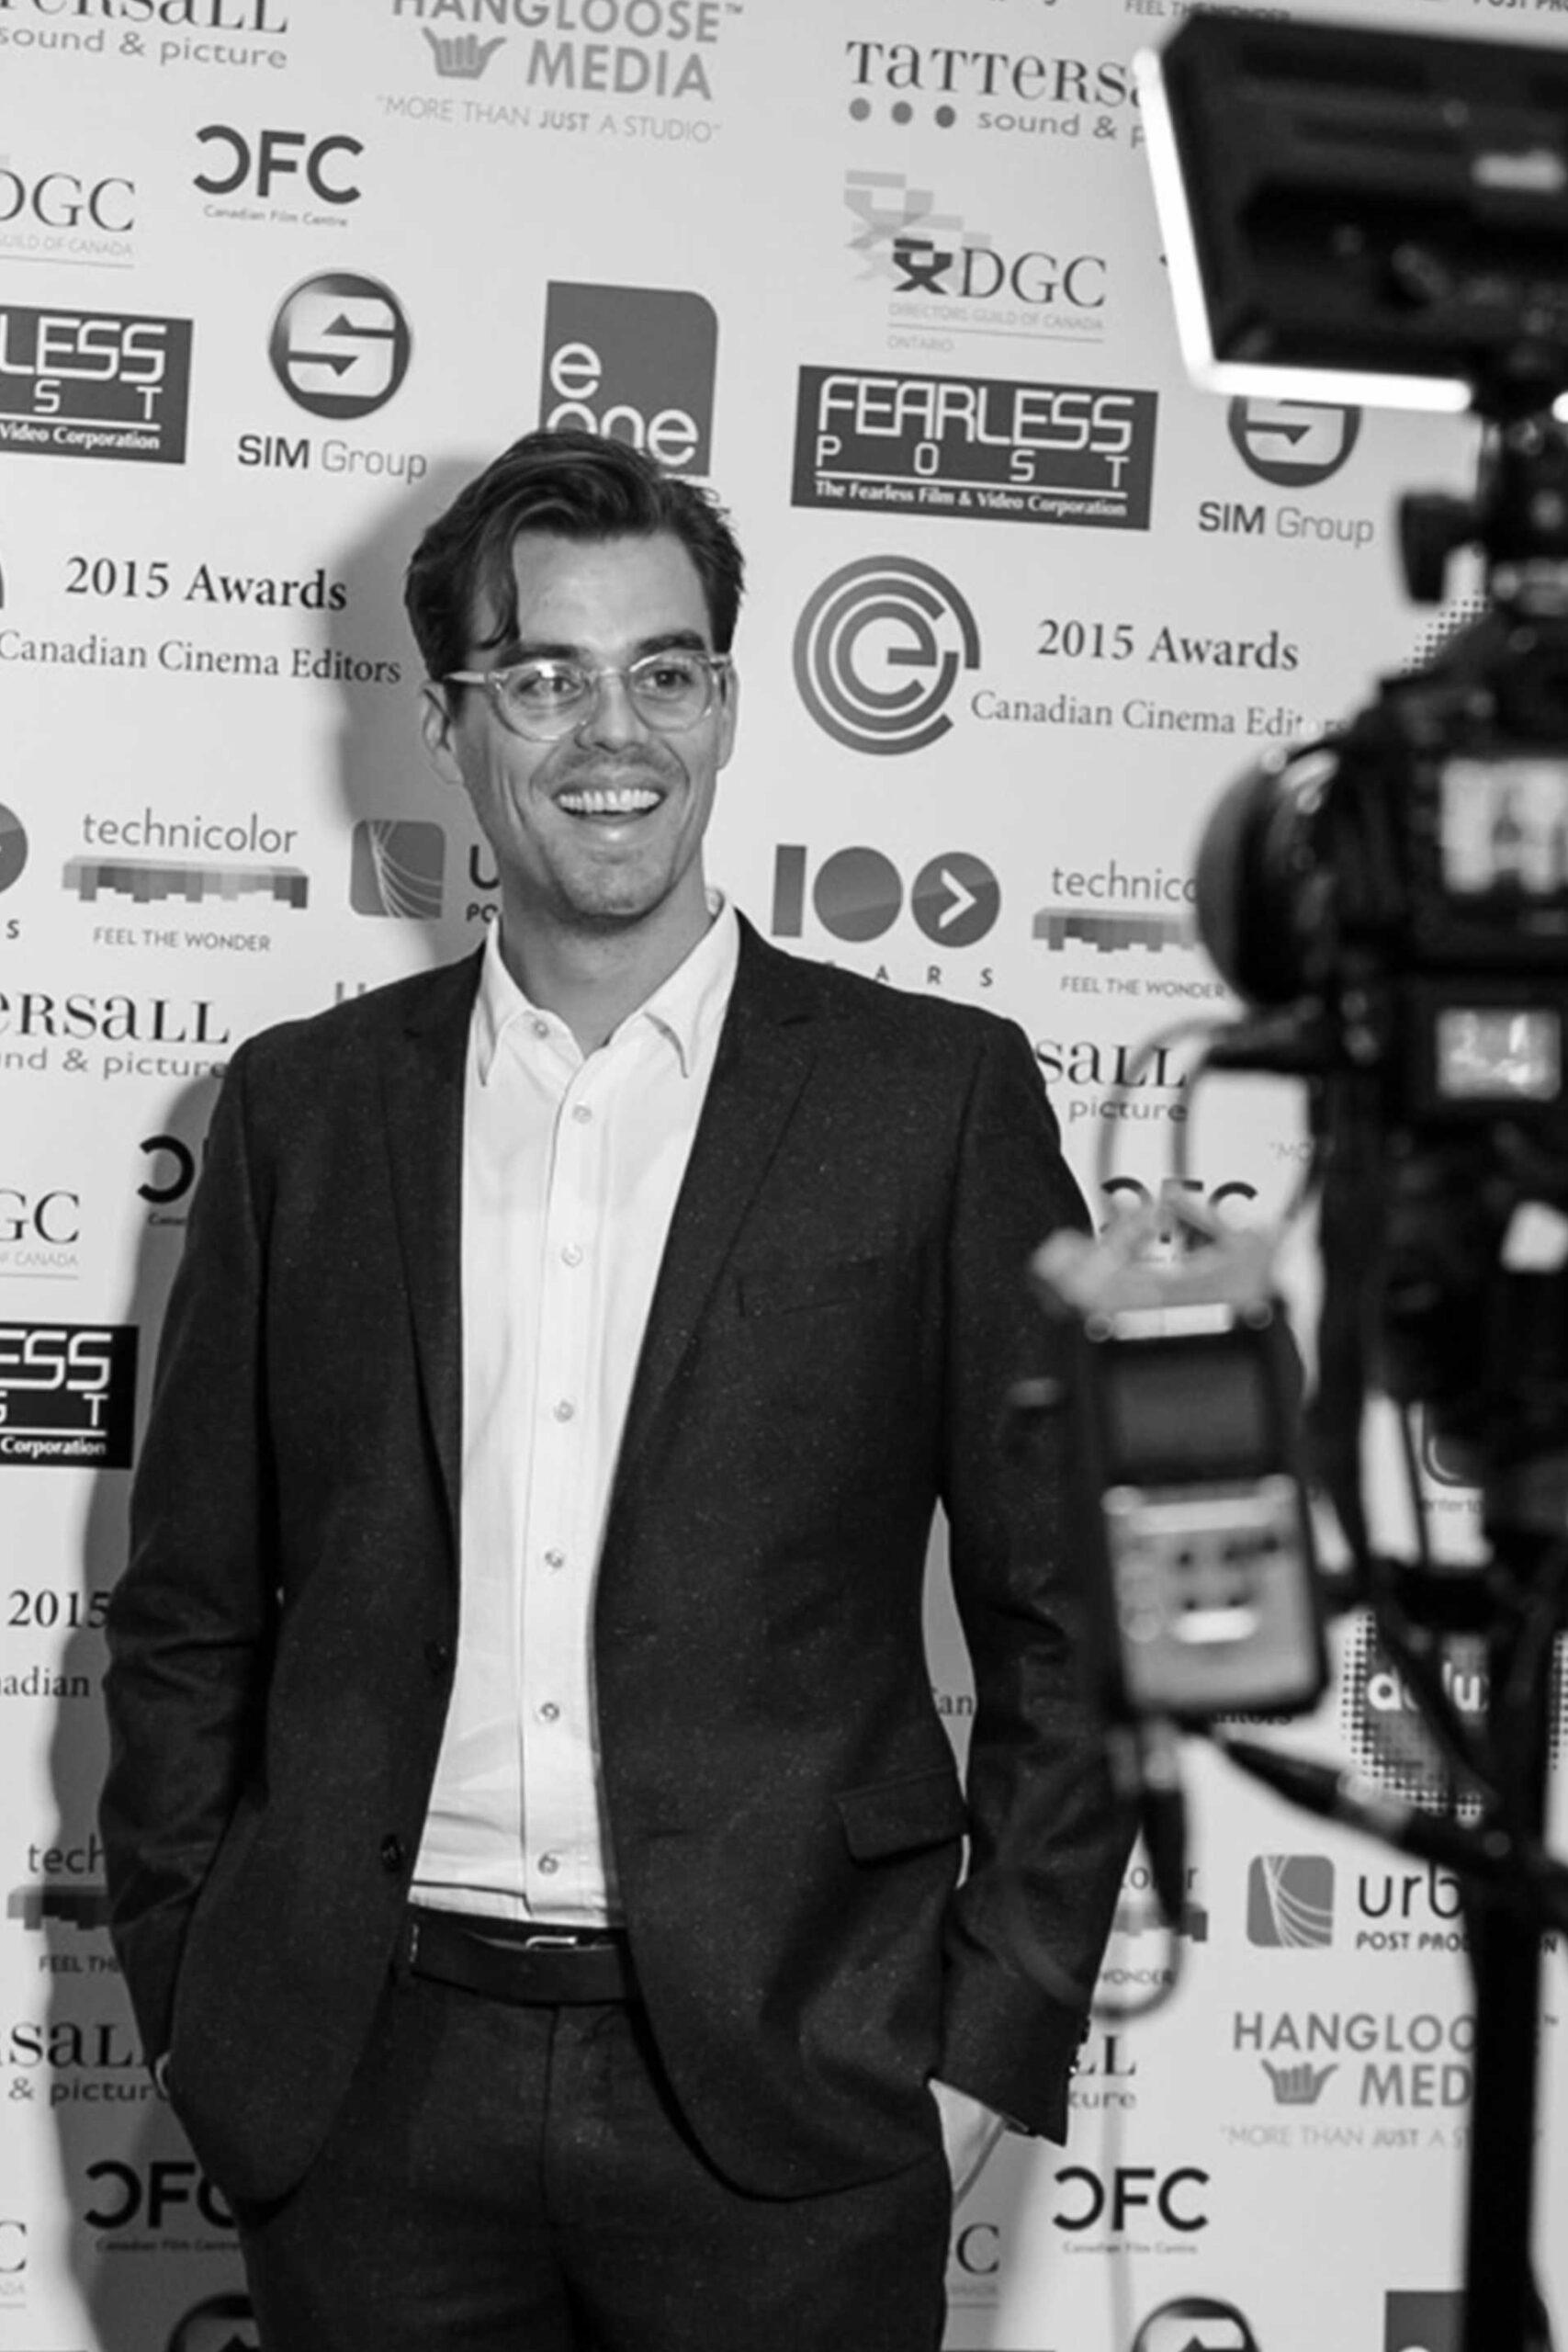 Awards Sponsorship Opportunity backdrop logos media and press